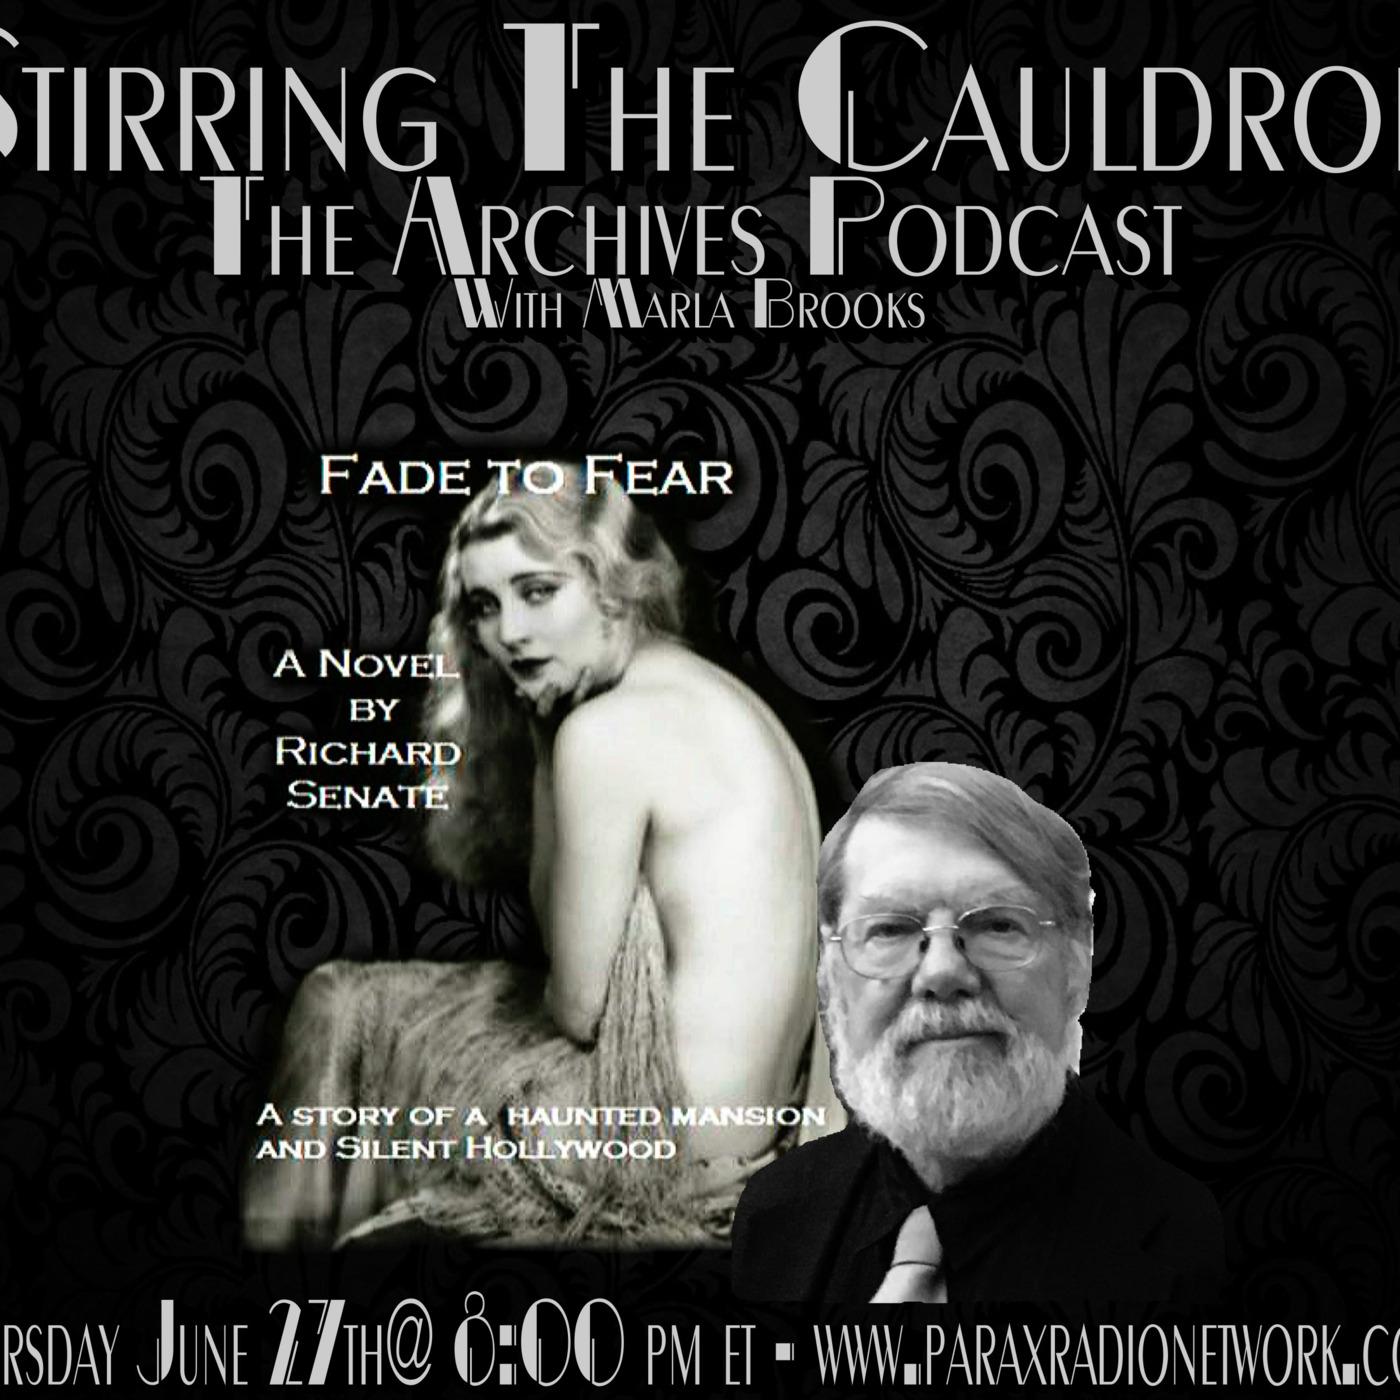 Richard Senate-Fade To Fear Stirring The Cauldron podcast